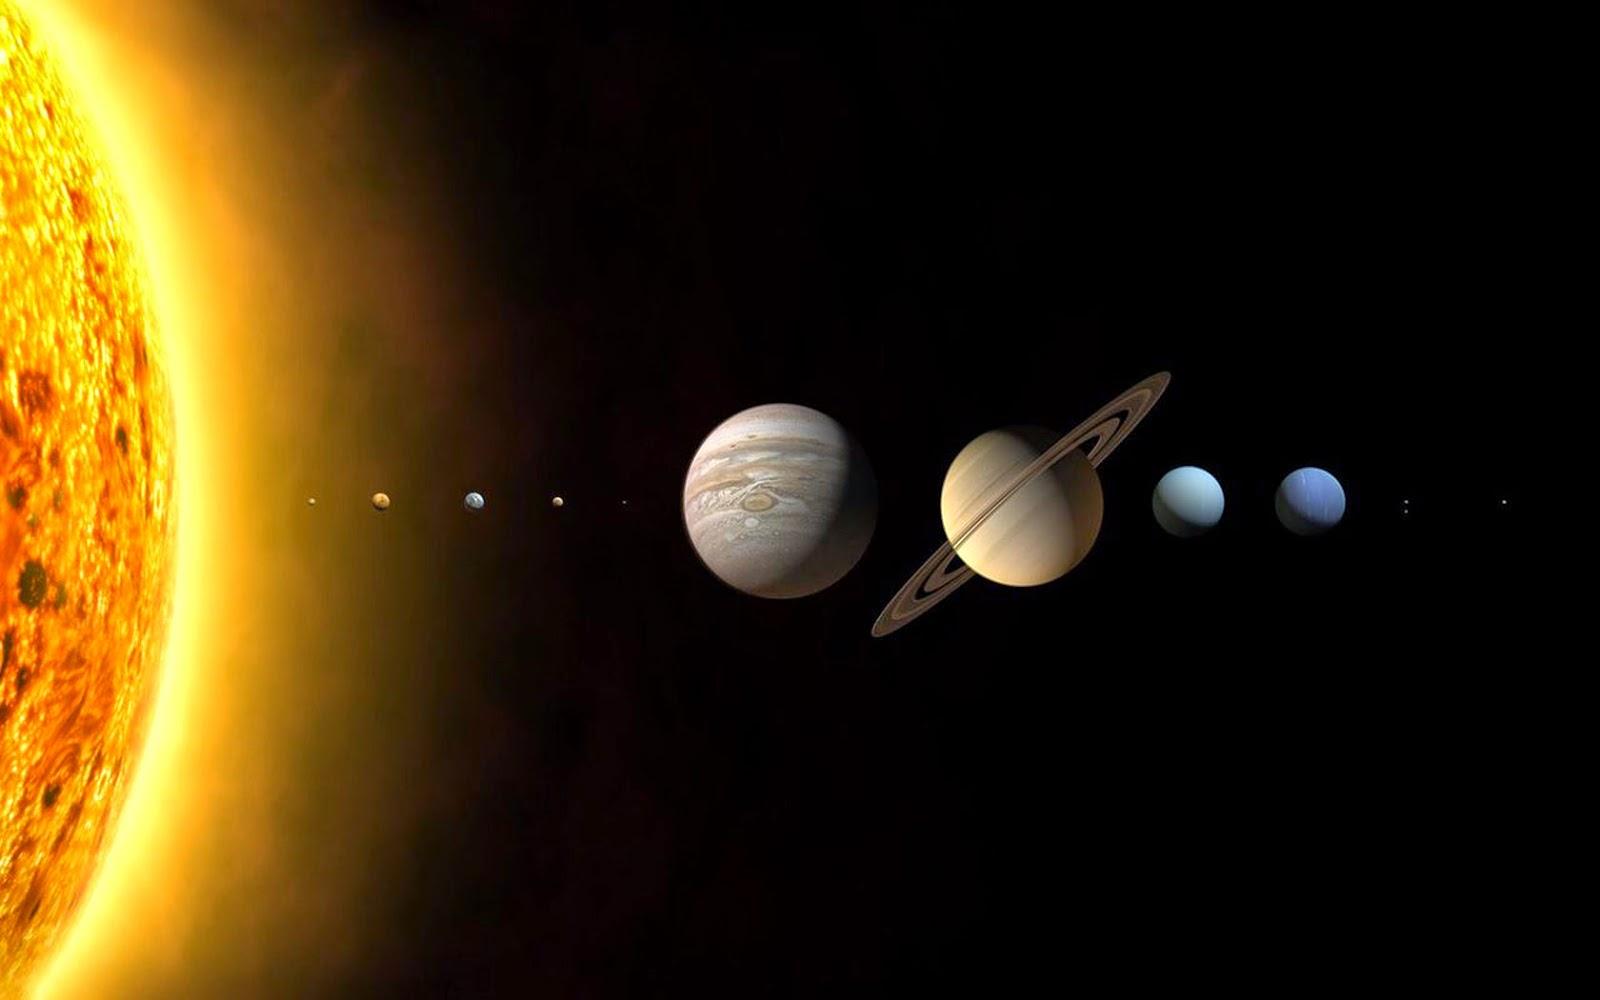 Papel de Parede Espaço Planetas do Sistema Solar para pc hd 3d grátis Space desktop hd wallpaper image free